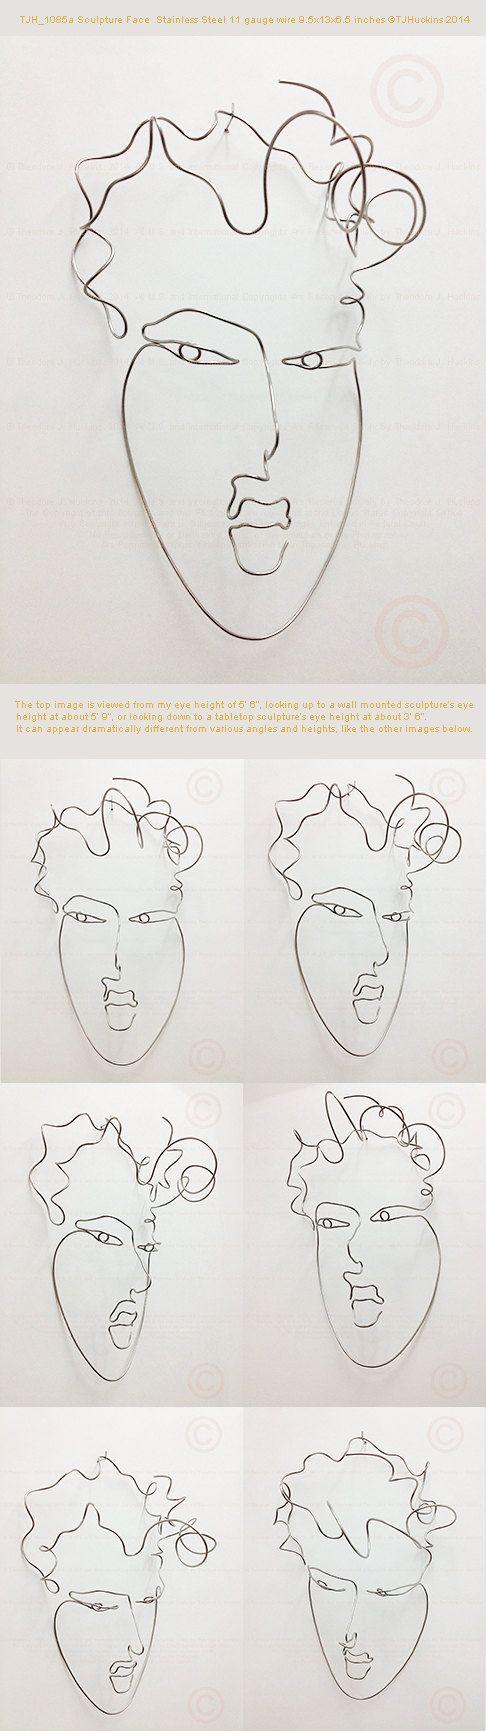 20 best wire sculptures images on Pinterest | Wire sculptures, Wire ...